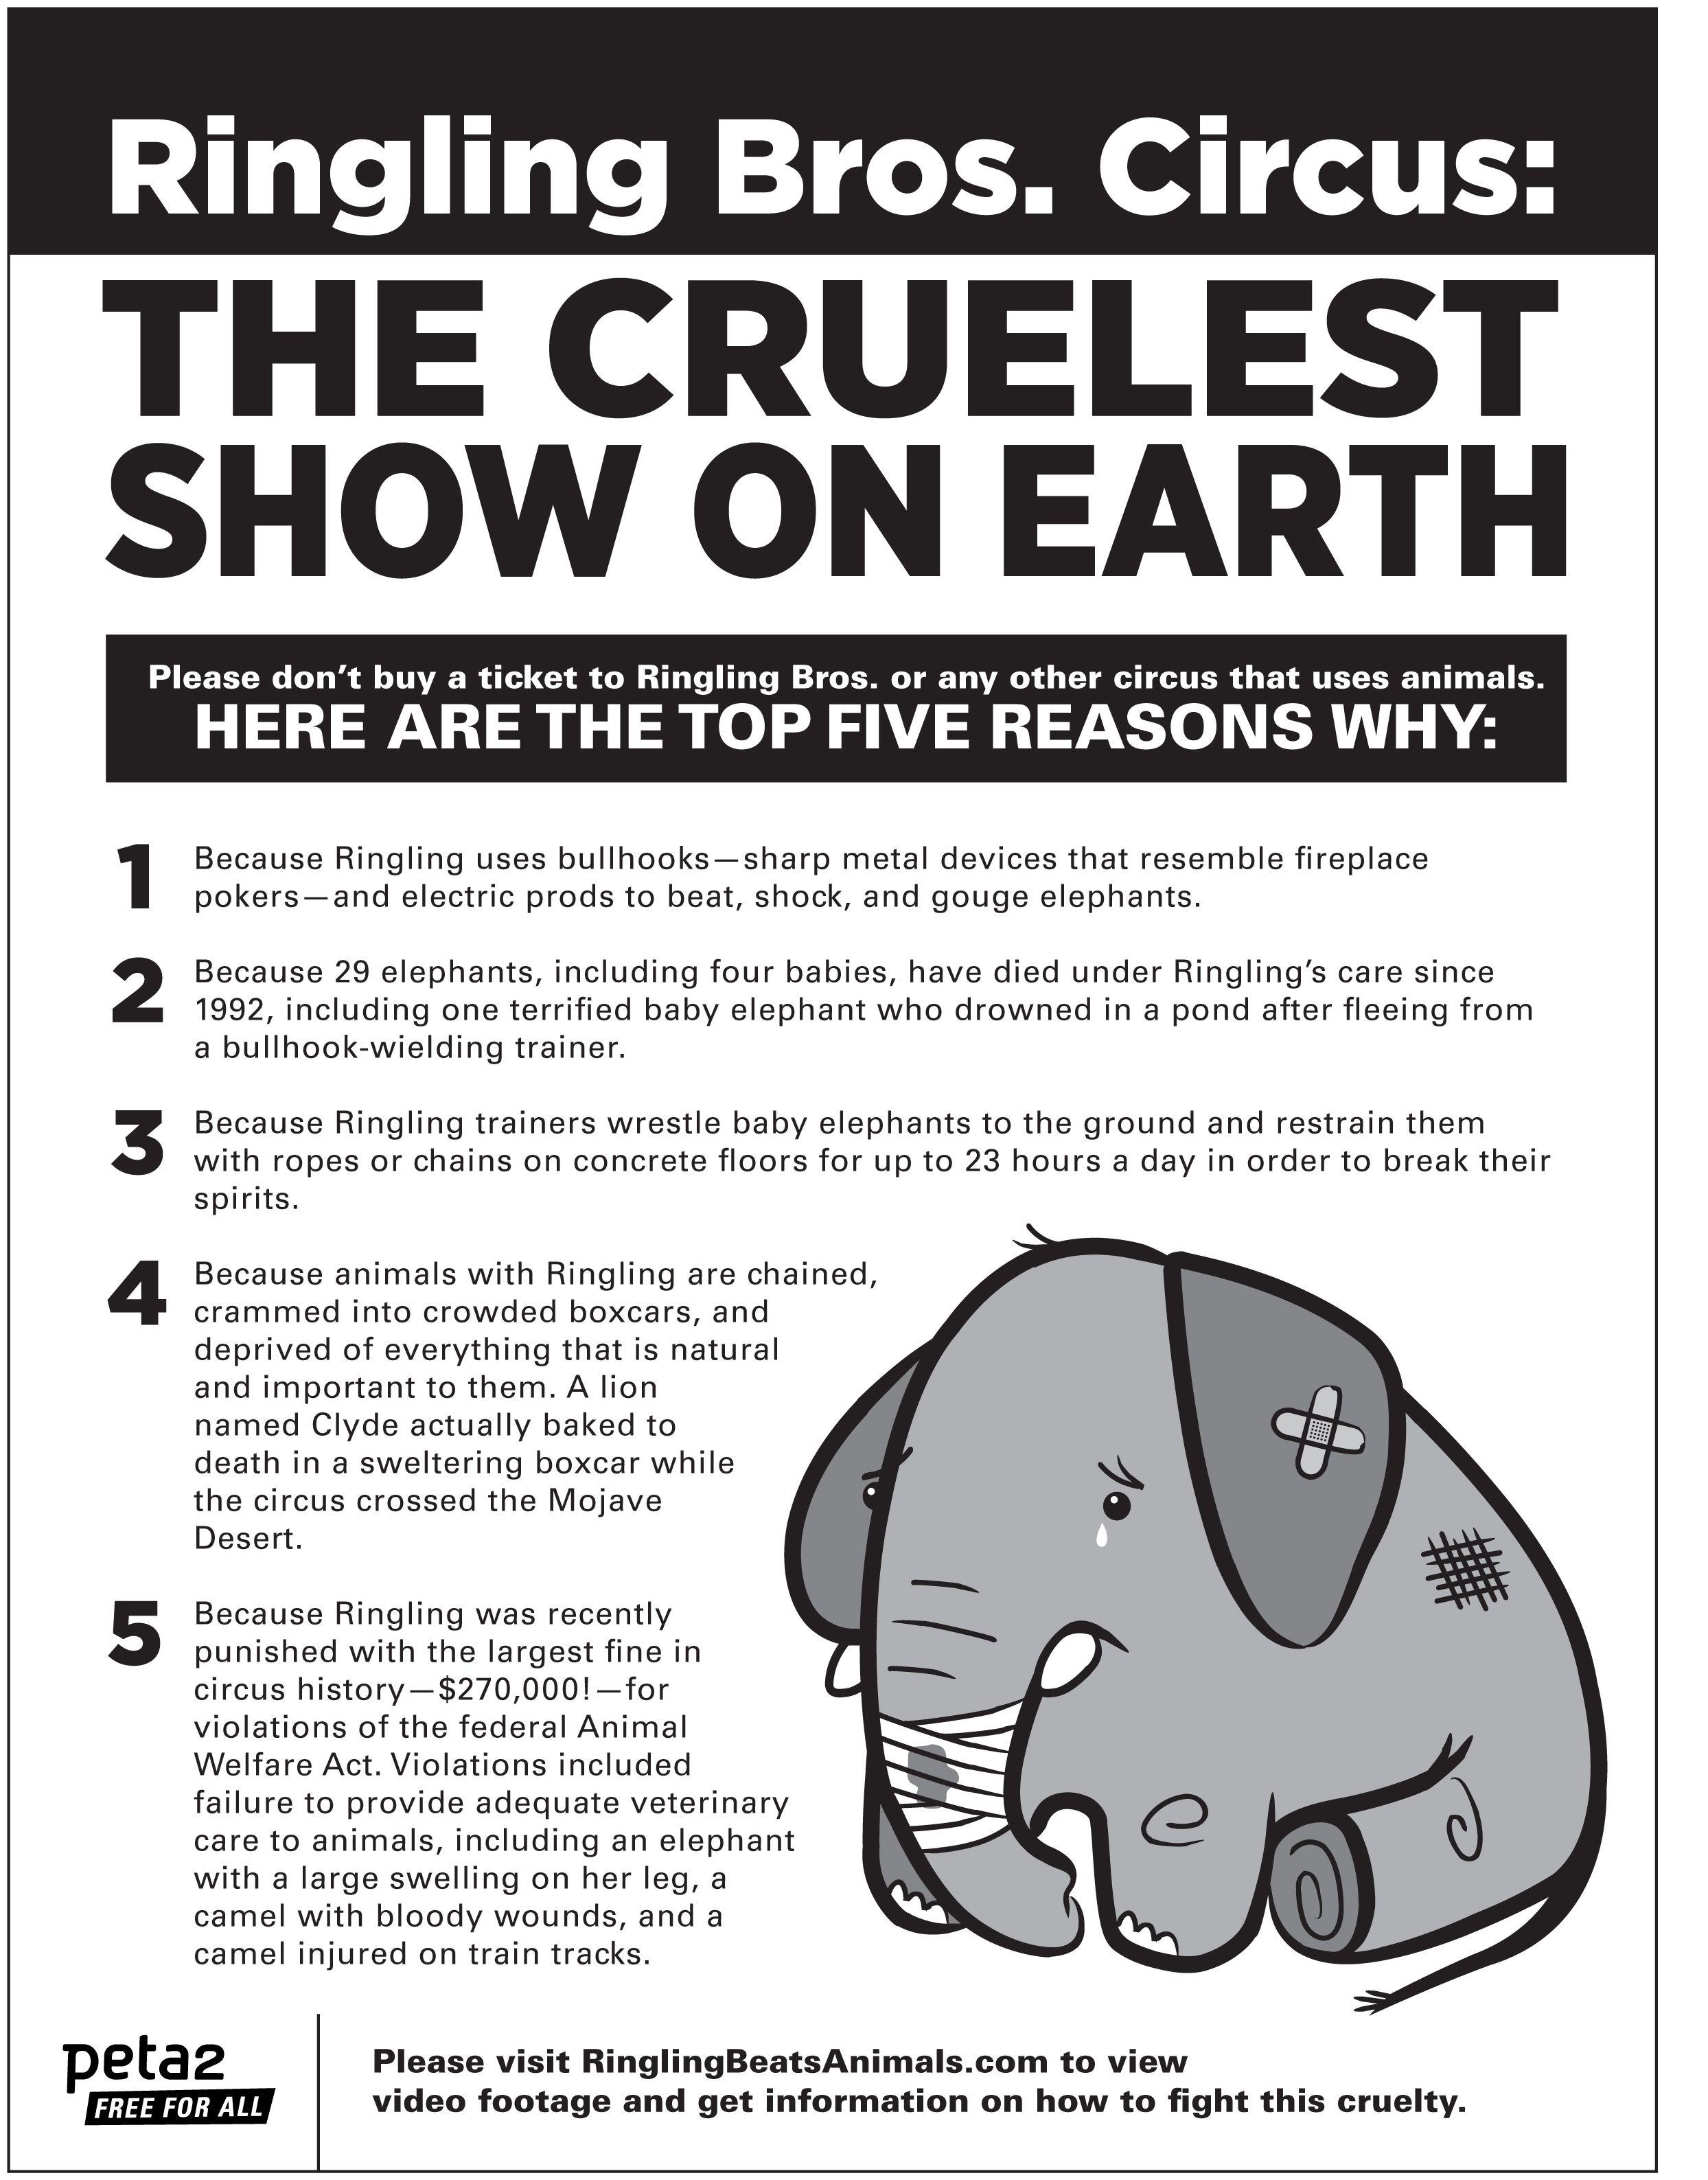 Cirque Du Soleil Meme: Boycott Ringling Bros. Circus, They Abuse Their Animals